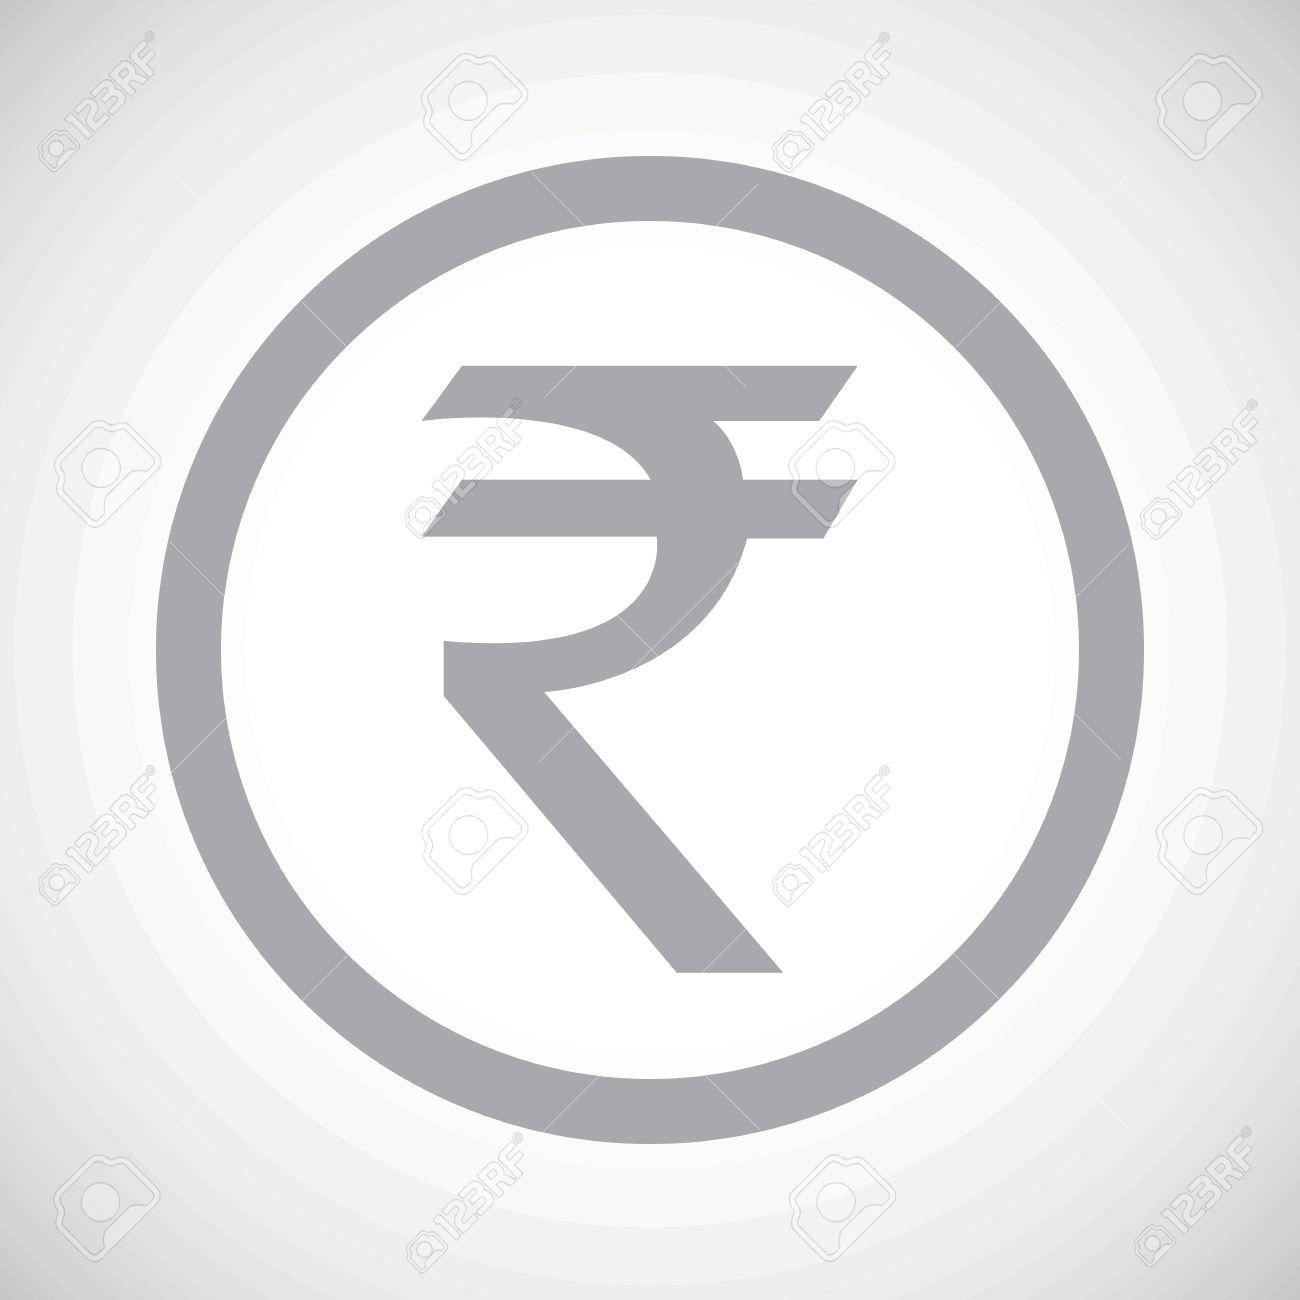 Grey indian rupee symbol in circle on white gradient background grey indian rupee symbol in circle on white gradient background stock vector 41529380 buycottarizona